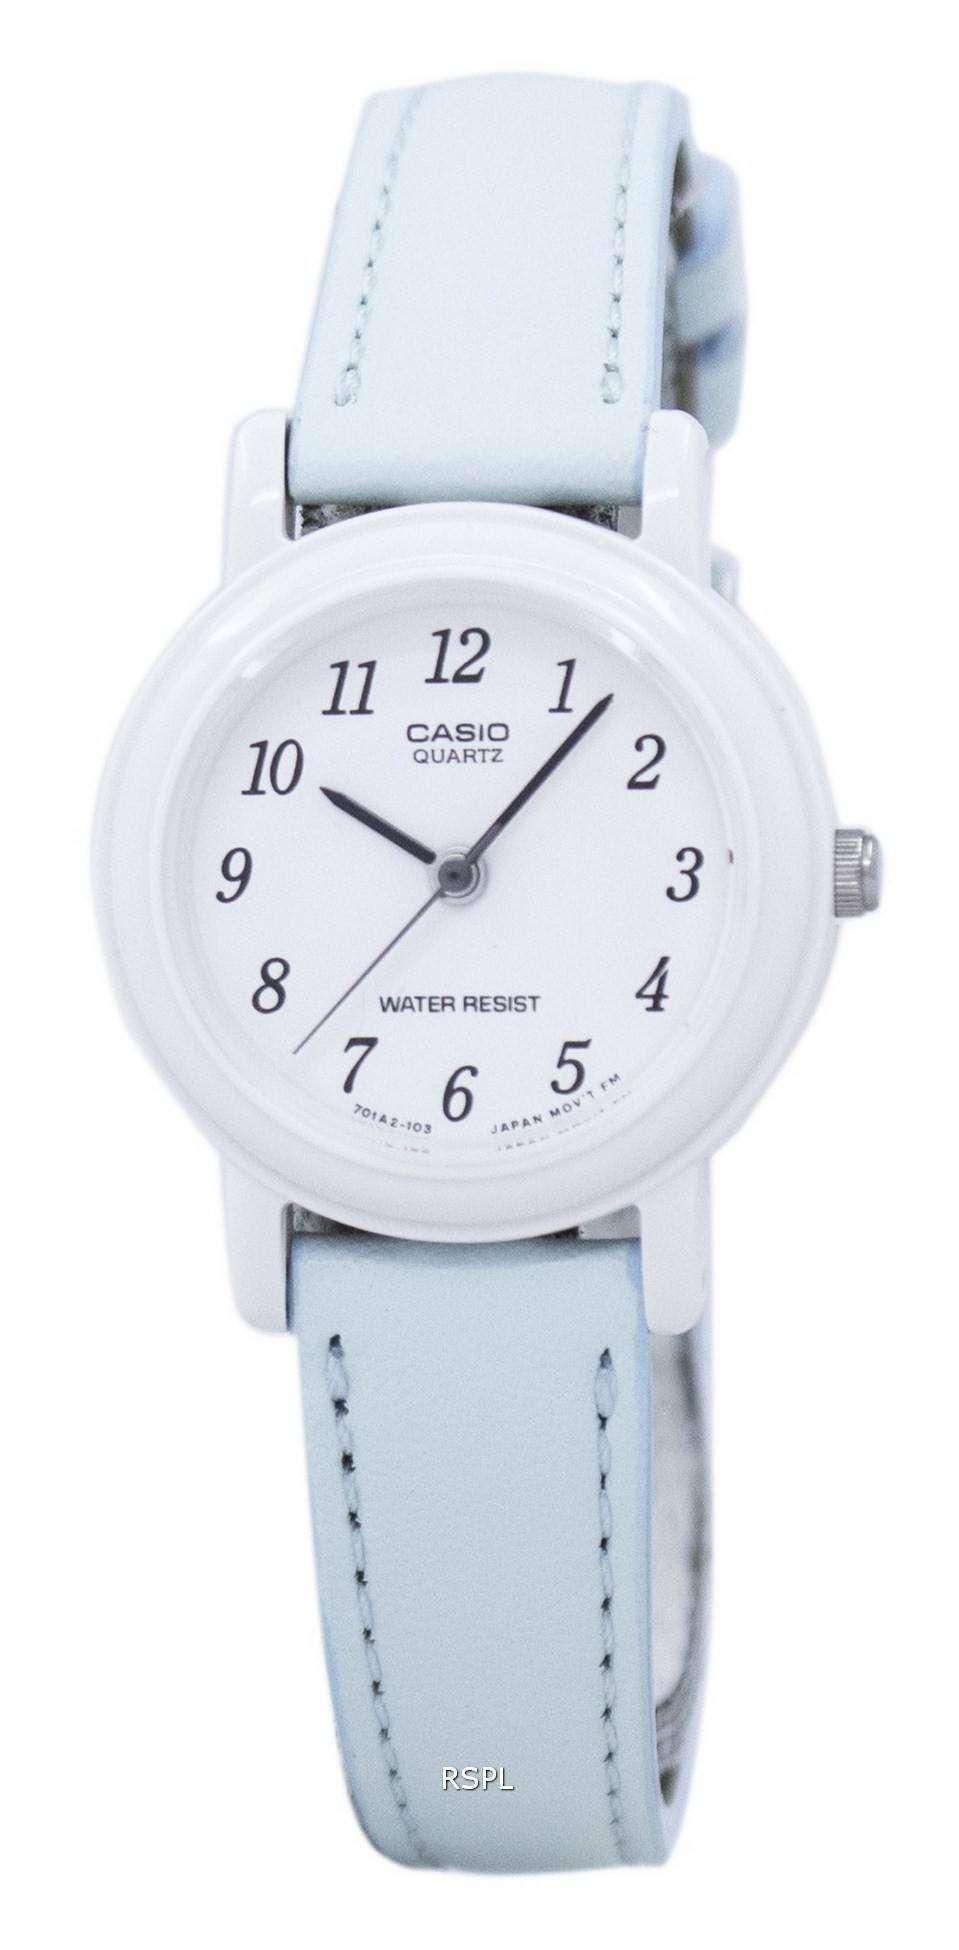 86a8f42d7d6e Reloj Casio analógico cuarzo LQ139L de LQ-139L-2B-2B Femenil ...